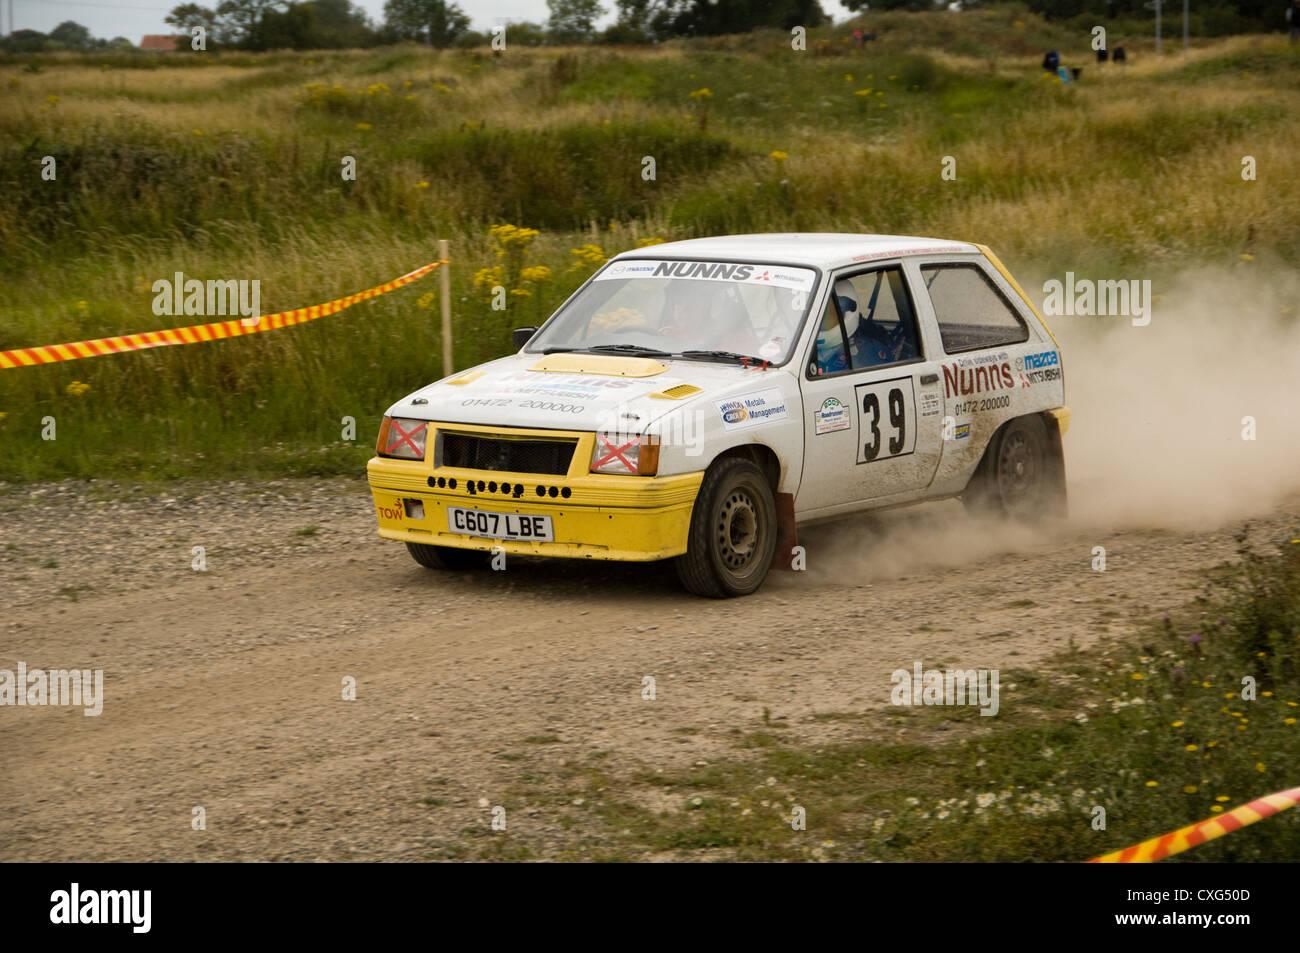 Vauxhall Nova rally car Stock Photo: 50756957 - Alamy